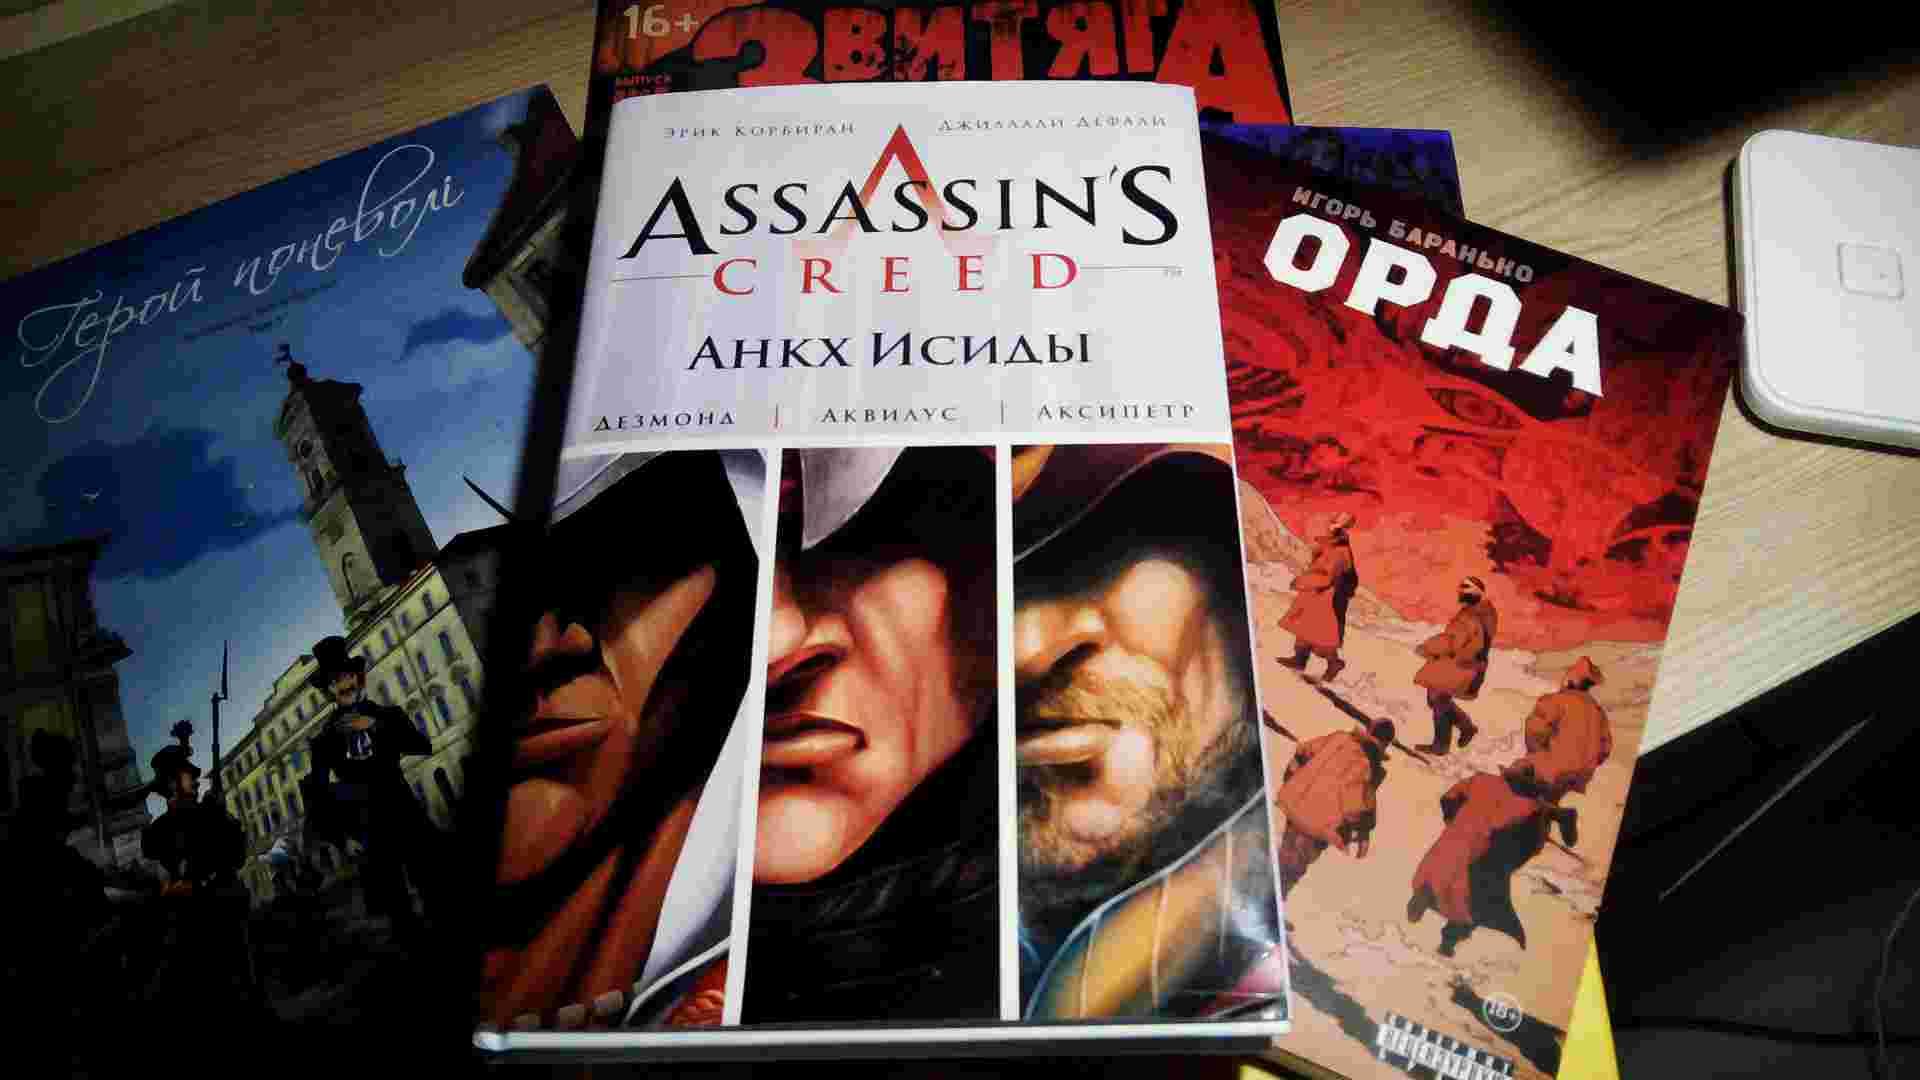 Огляд коміксу Assassin's Creed: Анкх Ісіди / The Ankh of Isis Trilogy